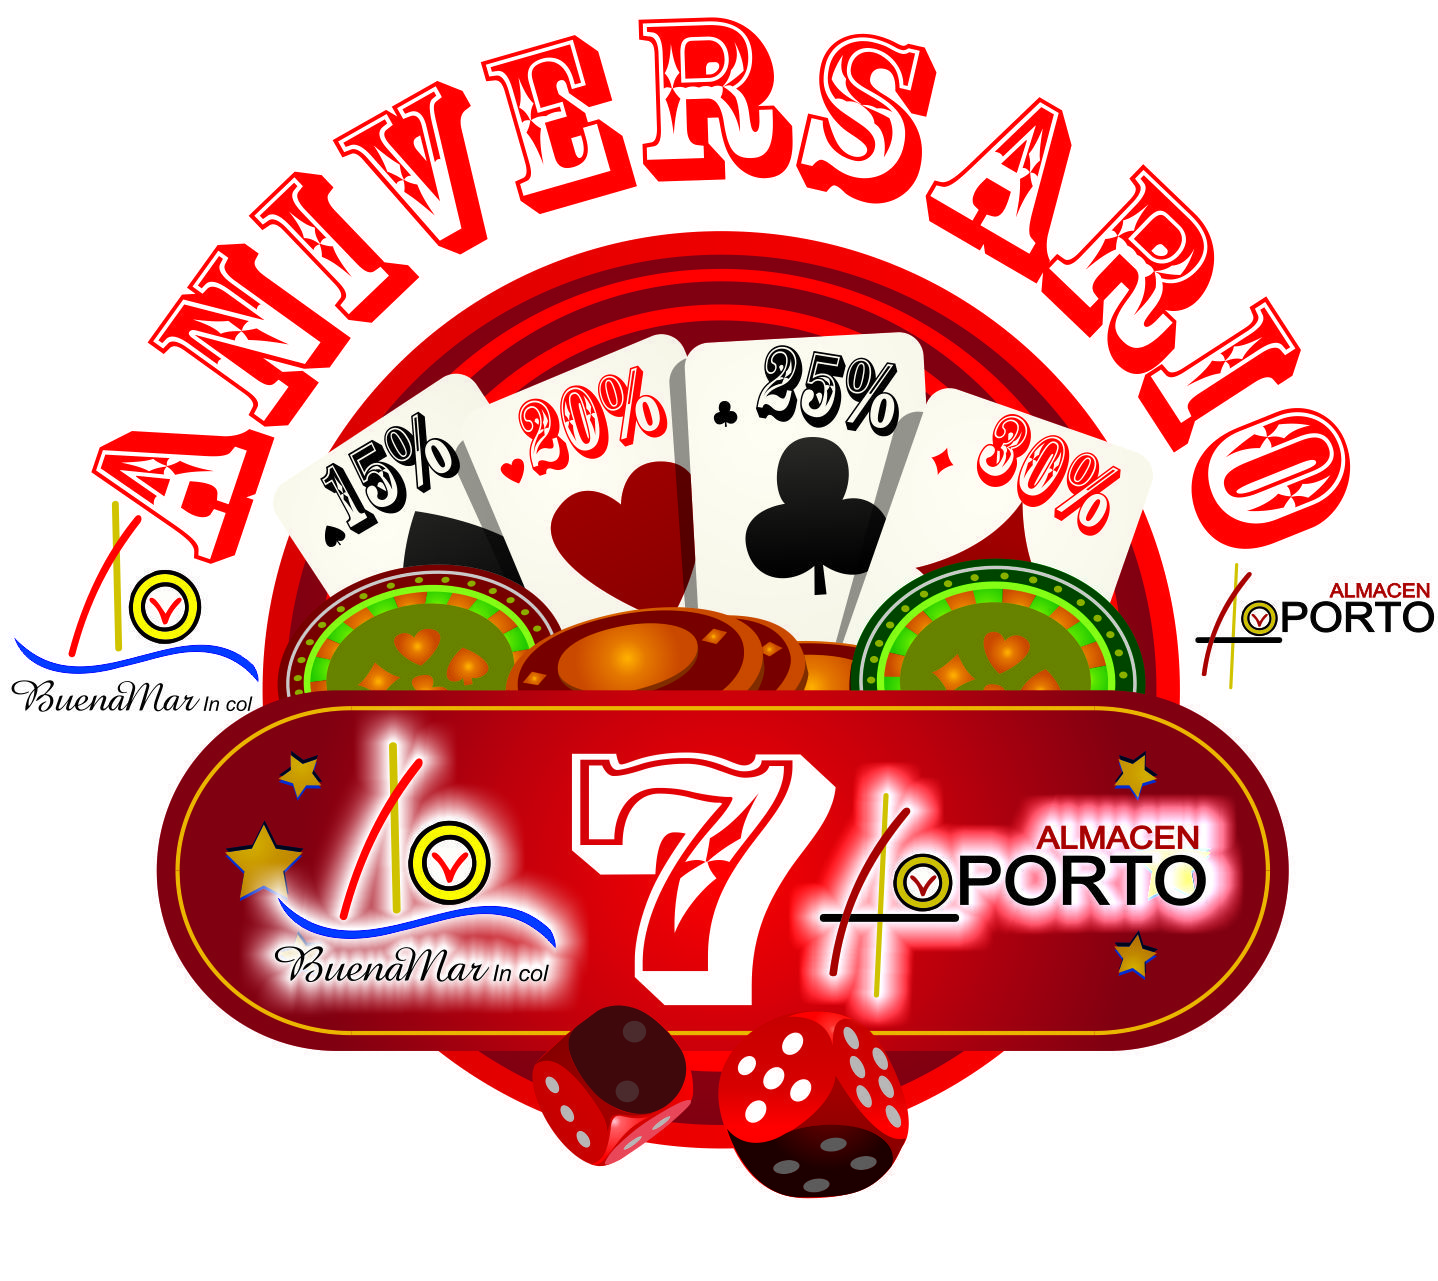 Aniversario @almacenoporto1 #Cartago #Pereira @JorgeEMoncadaA